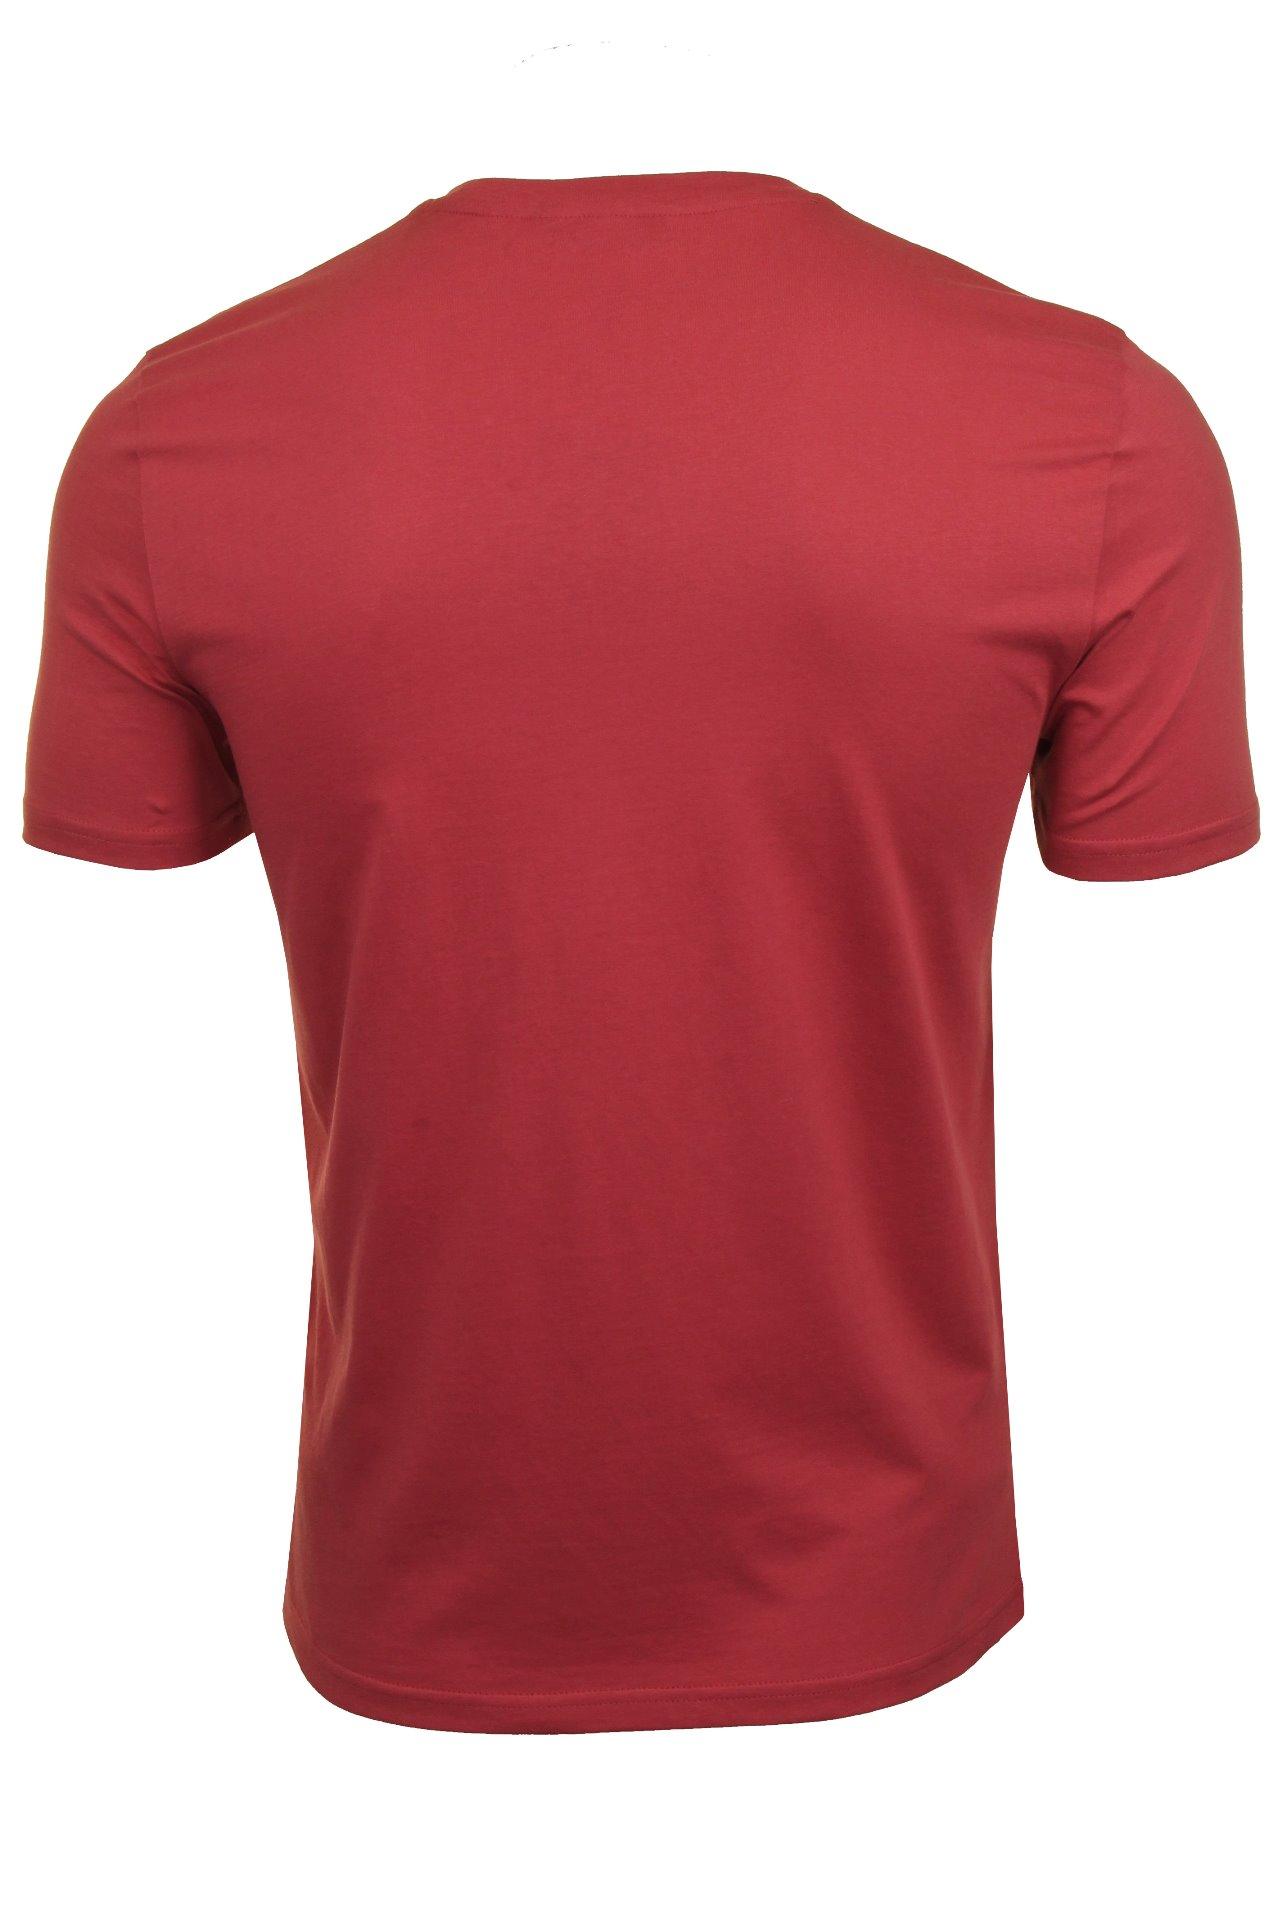 Mens-Classic-Spade-Pocket-T-Shirt-by-Ben-Sherman thumbnail 31